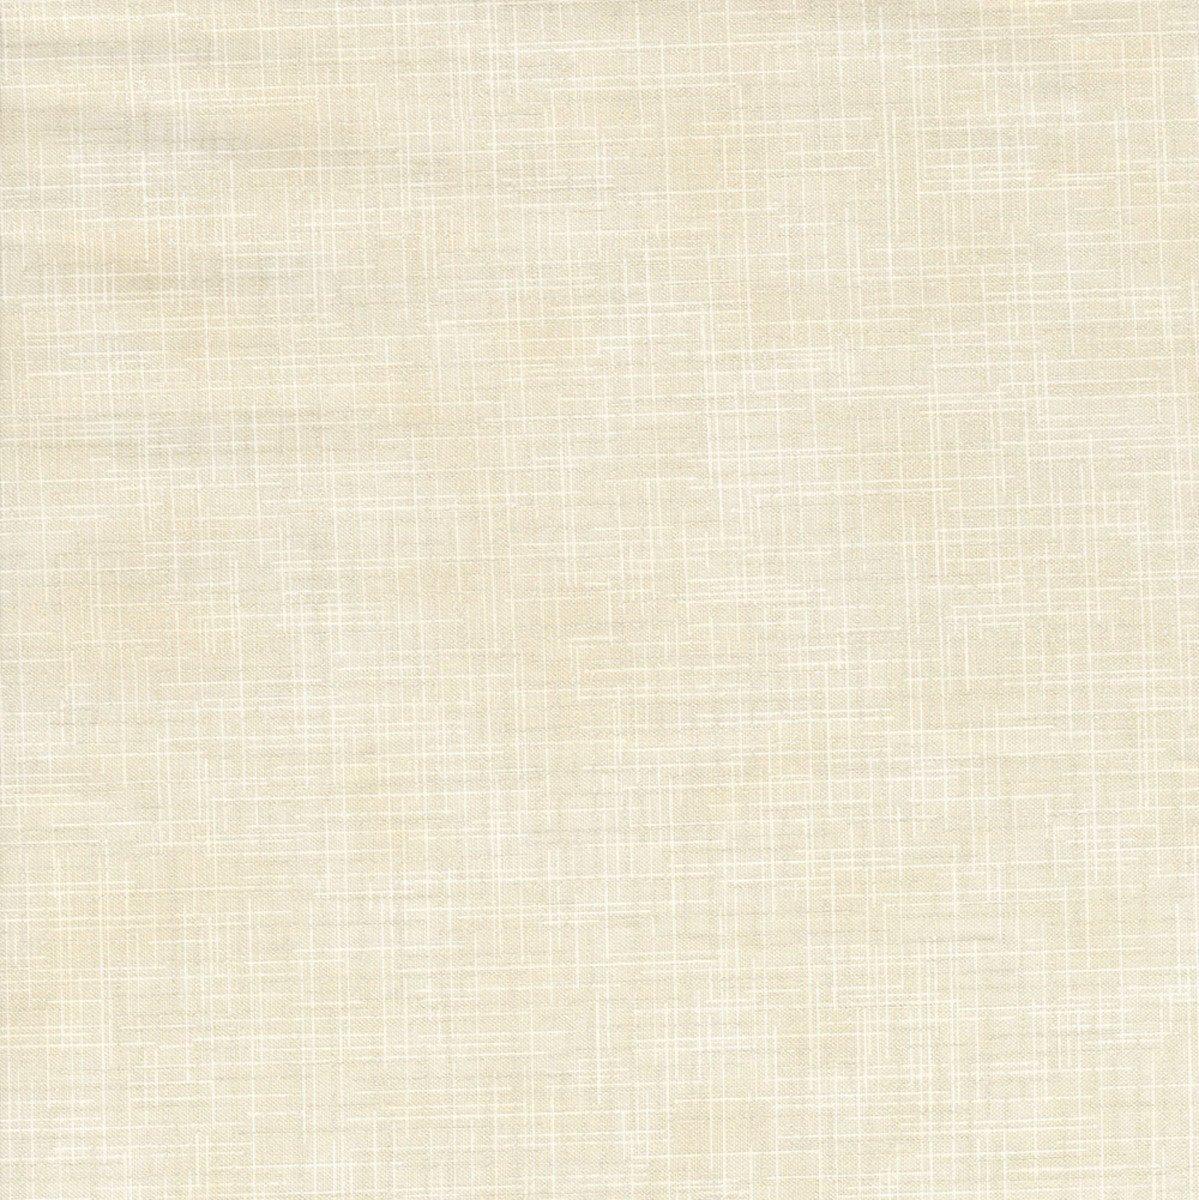 ROBERT KAUFMAN QUILTER'S LINEN PEARL CREAM SHIMMER 16687-84